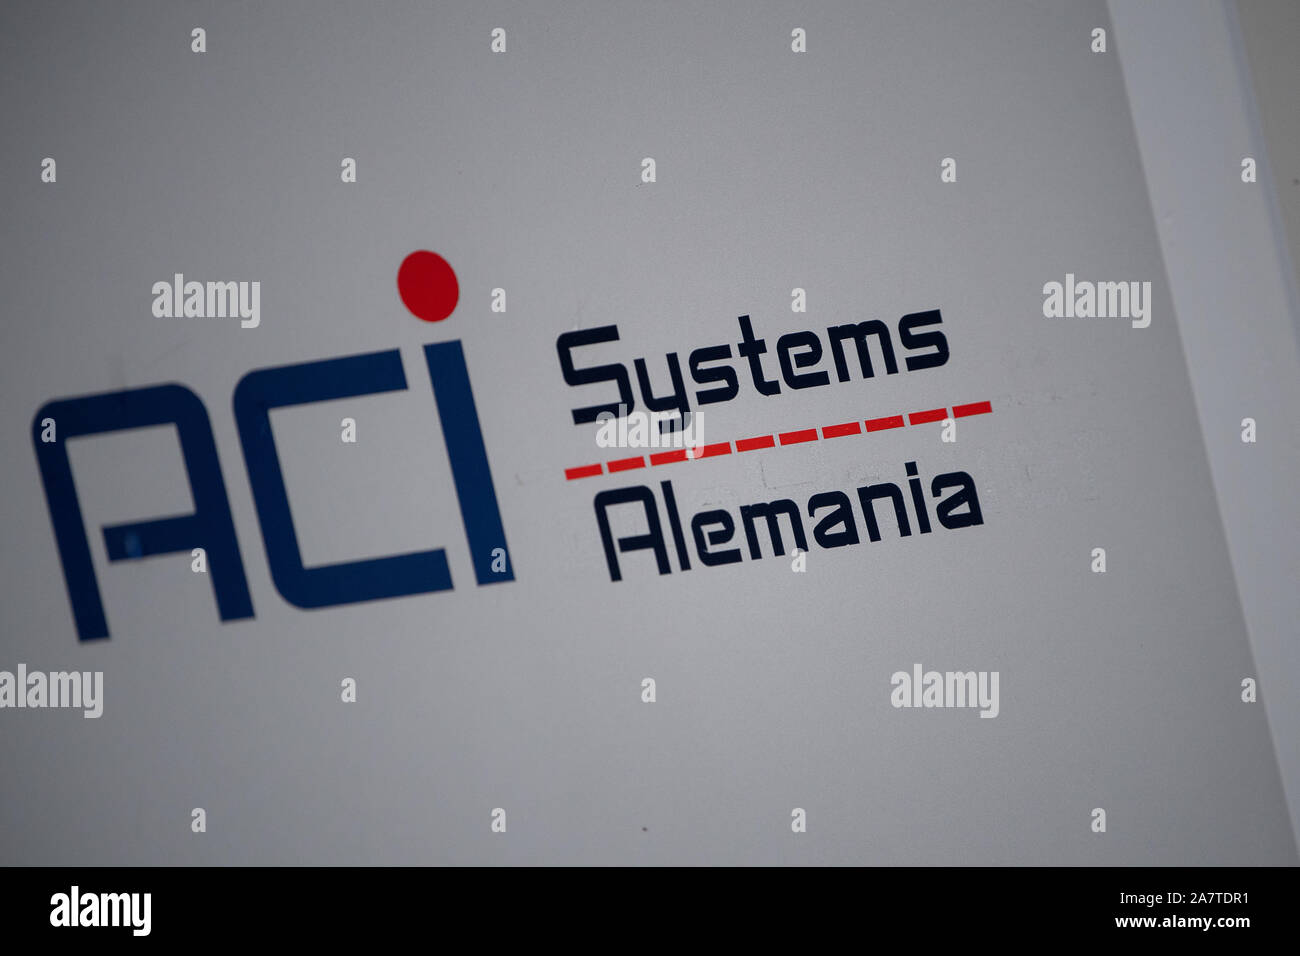 Alemania Aci systems